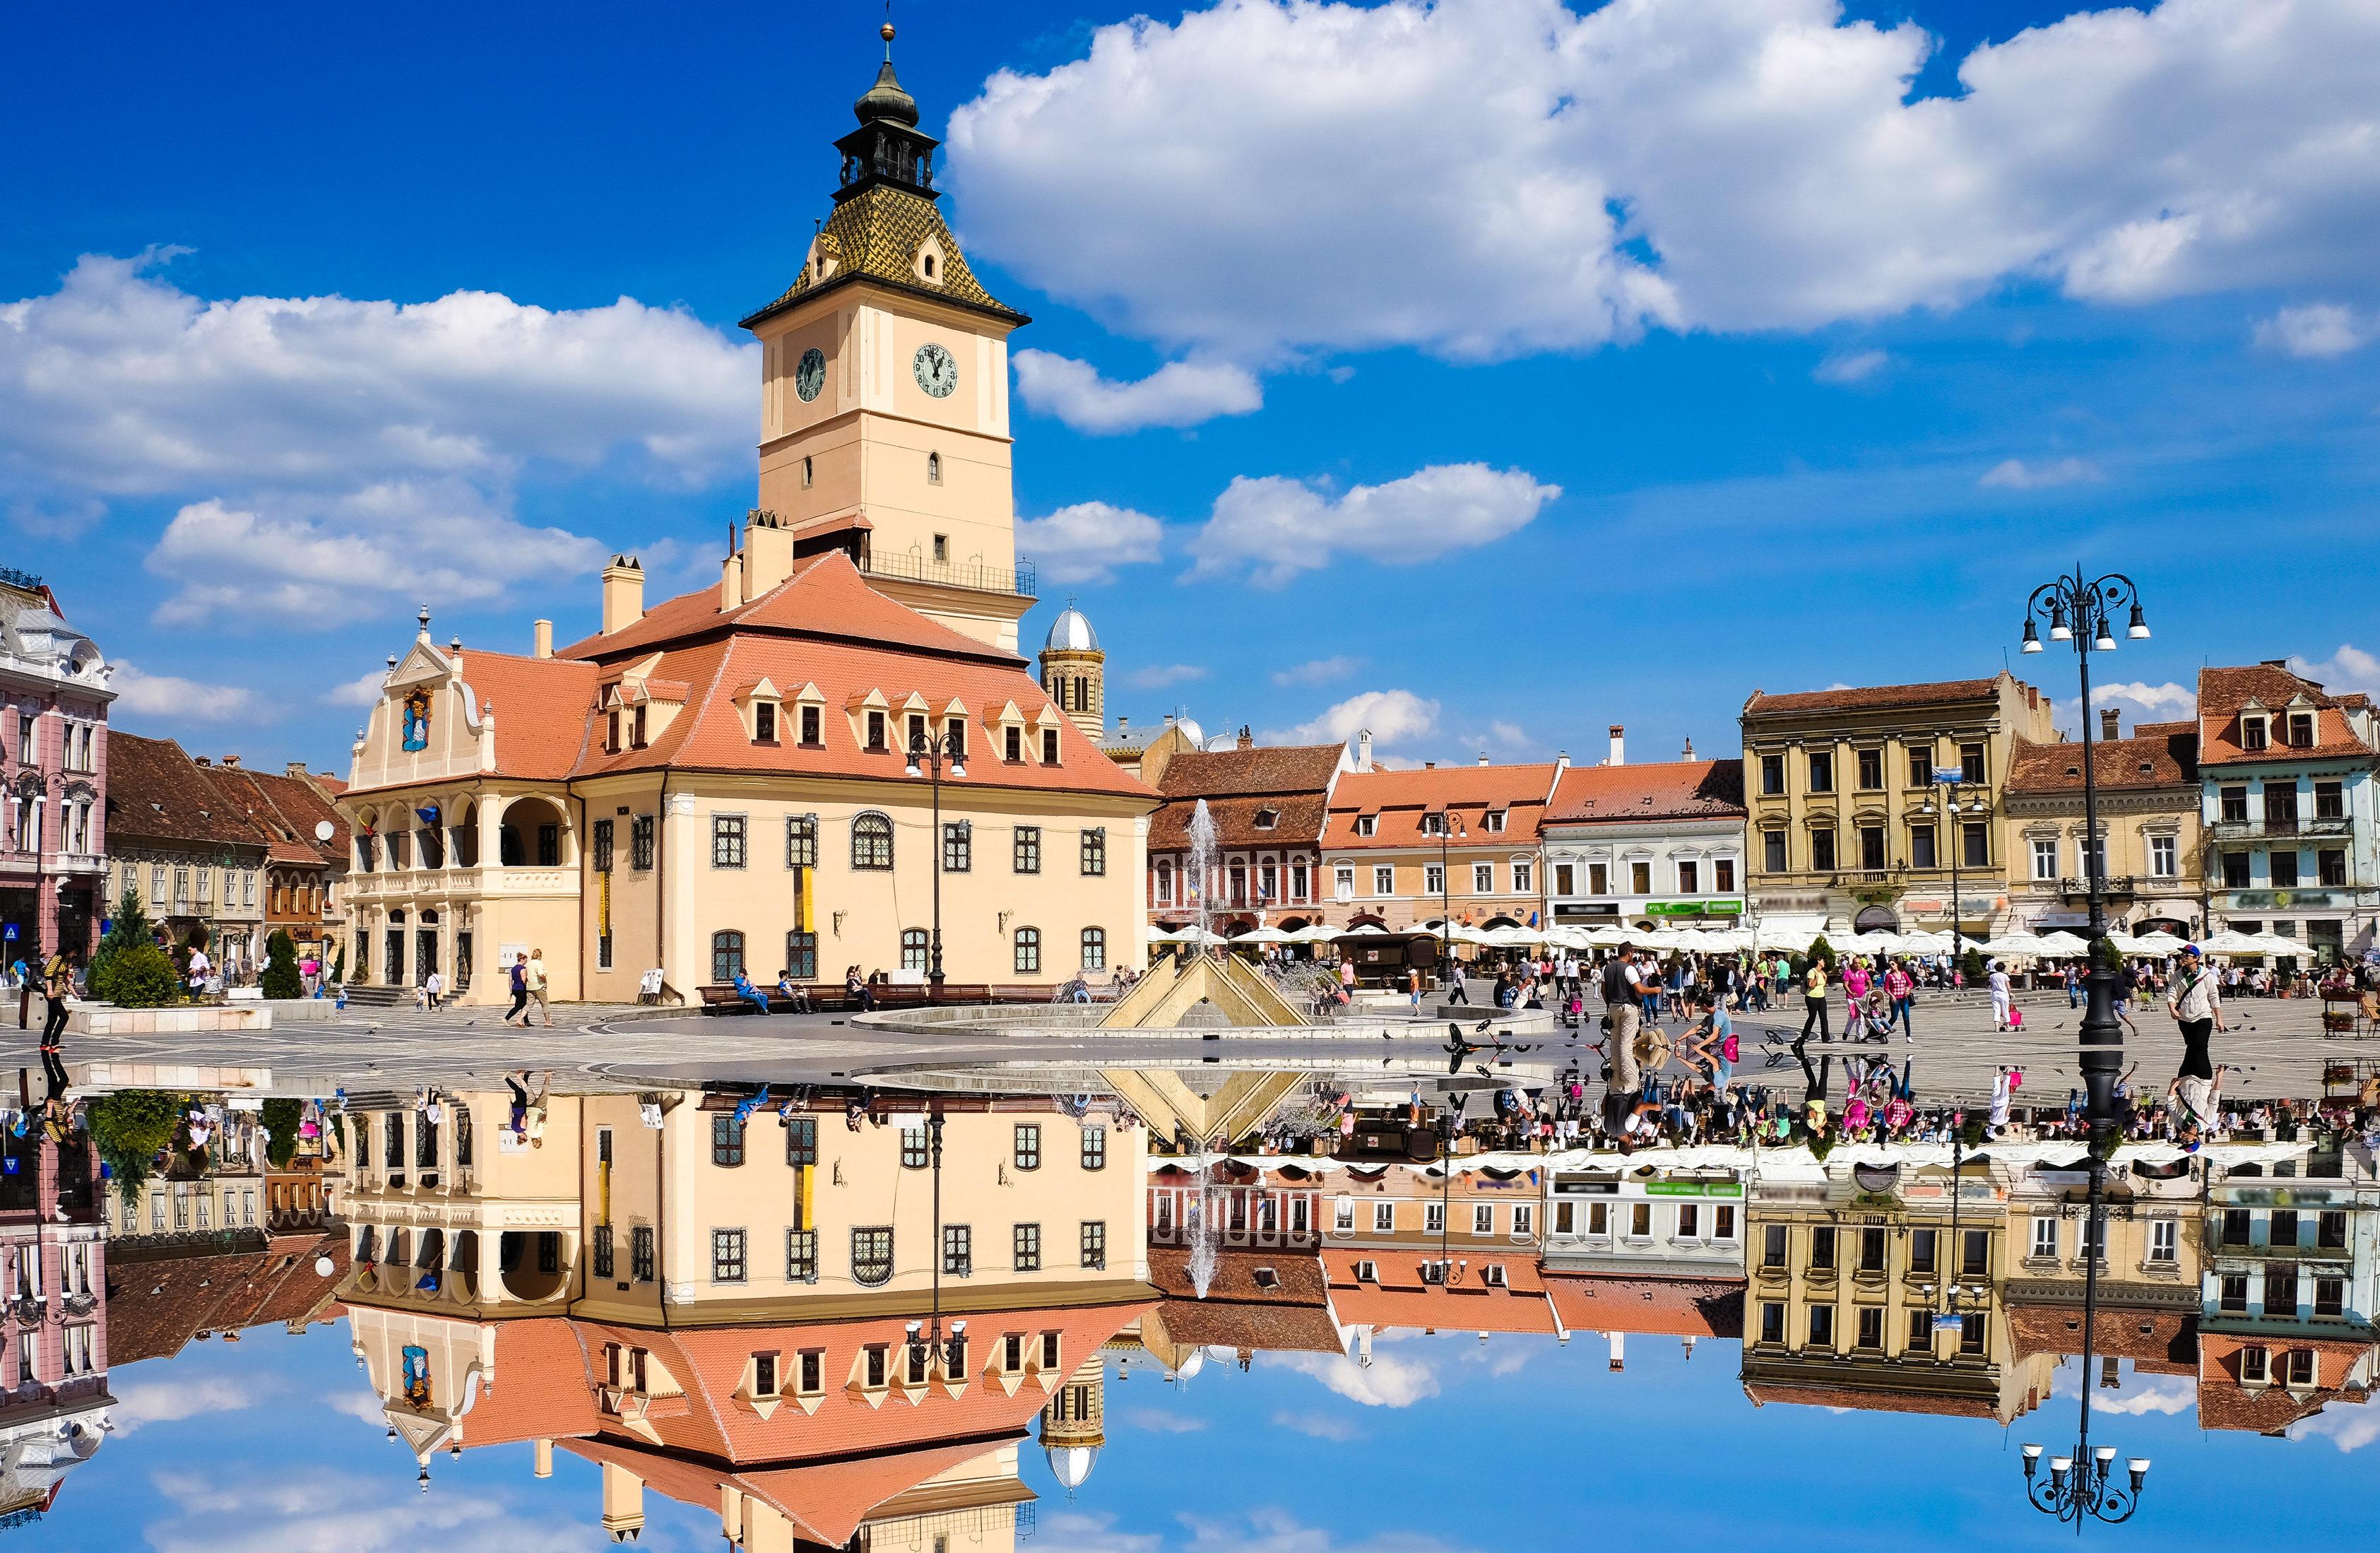 BRASOV, TRANSYLVANIA, ROMANIA. The old city center called Piata Sfatului. Important tourist attraction. One of the best cities in Transylvania. Artistic interpretation, mirror effect.